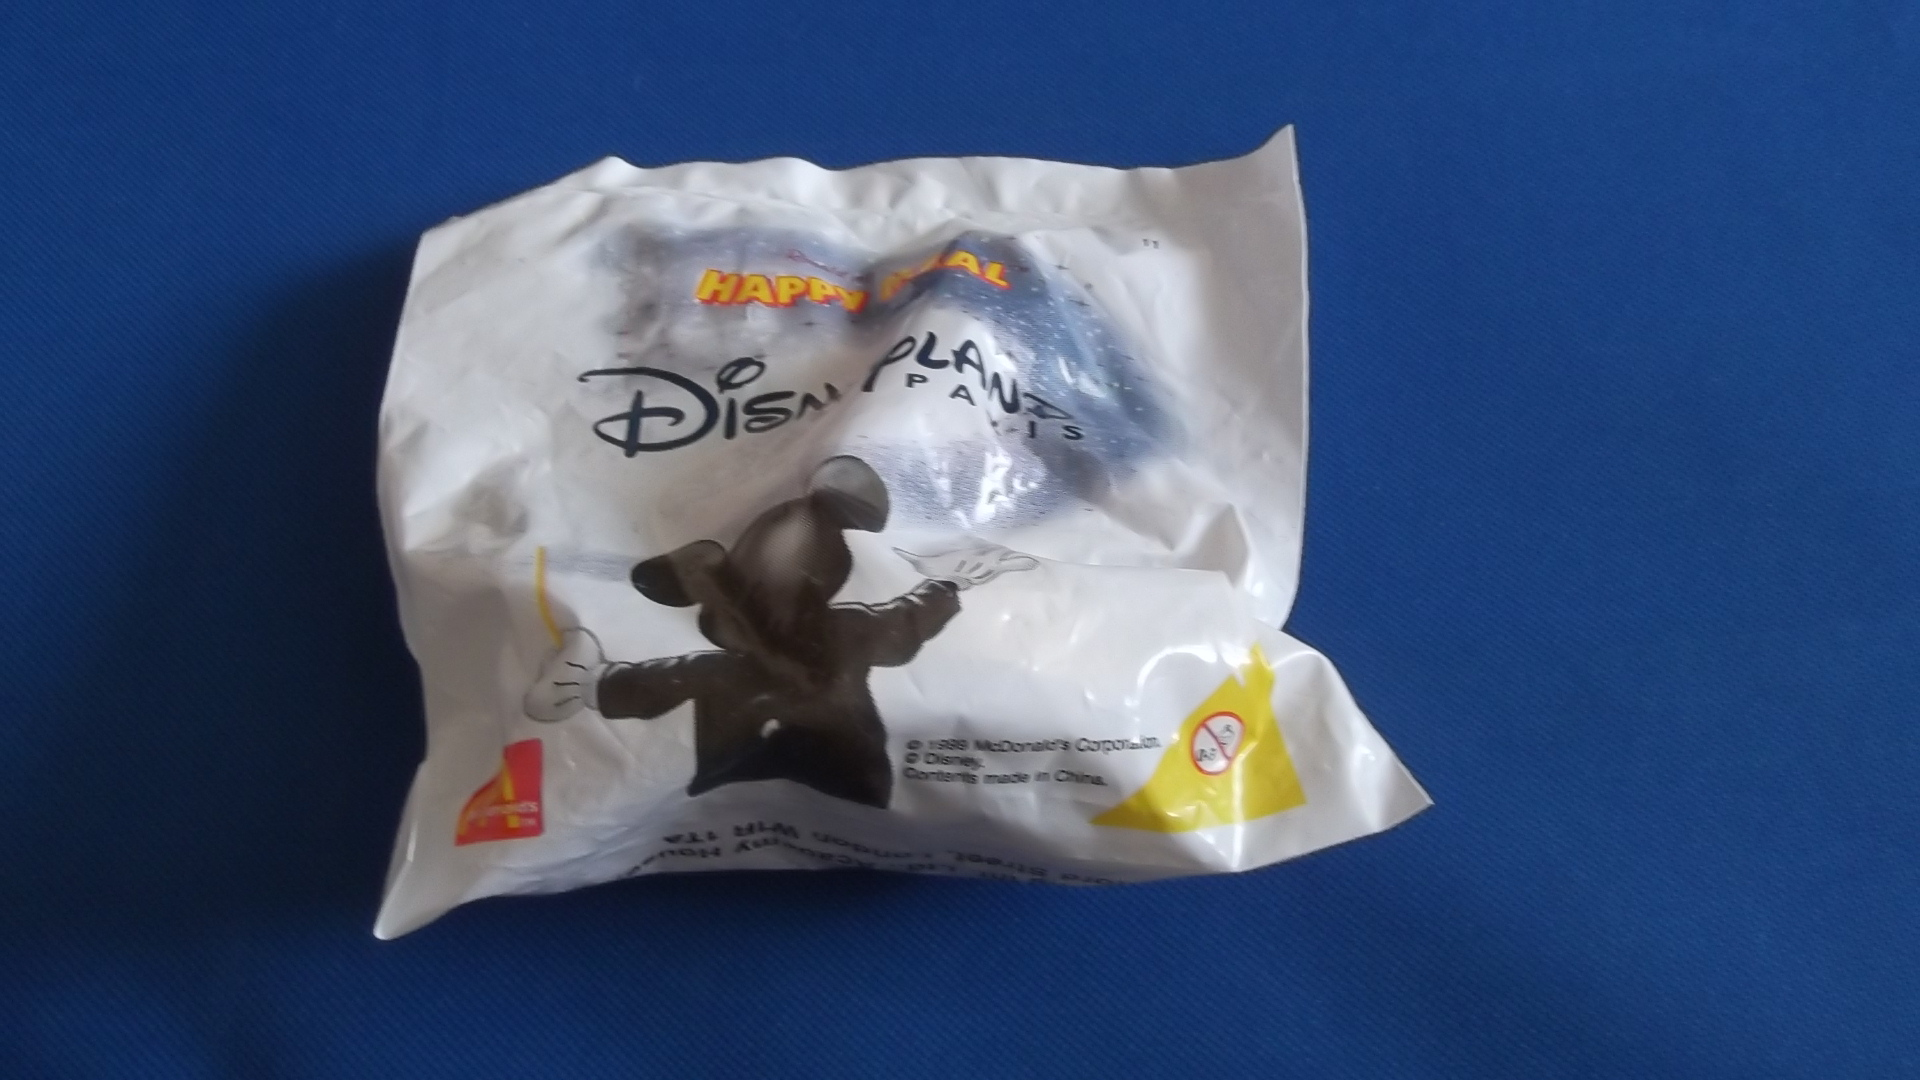 McDonalds Disneyland Paris Train #11 Toy From 1999 New